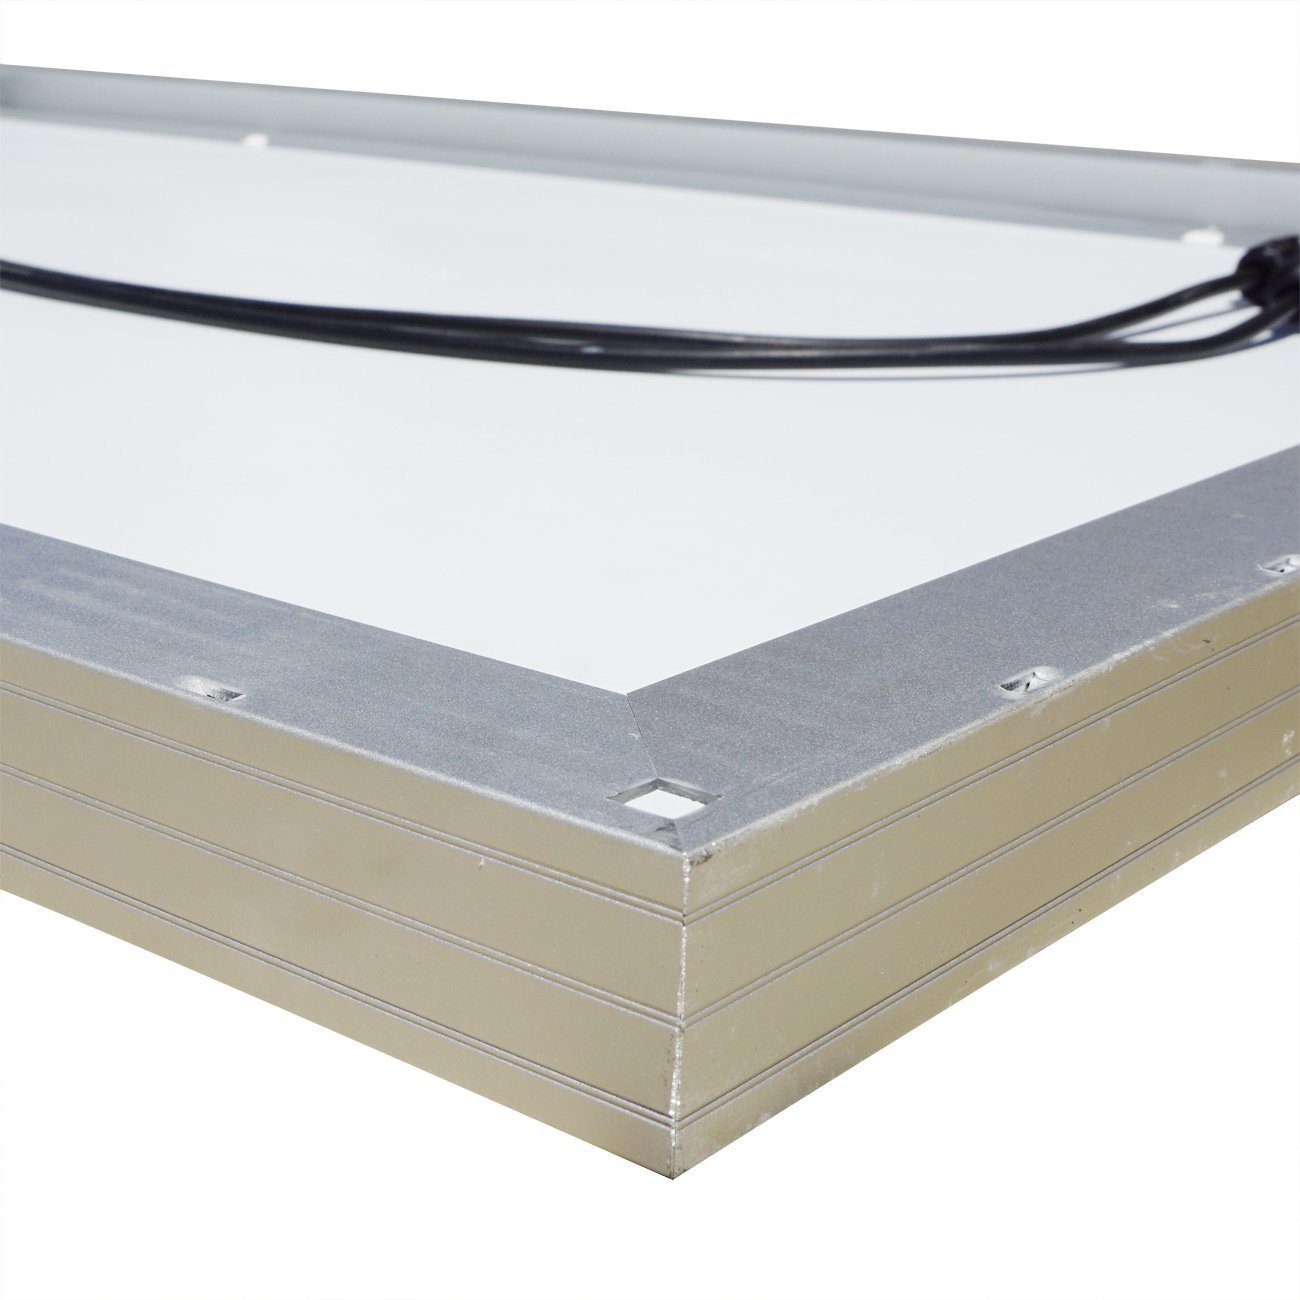 amazoncom eco worthy 500 watts complete solar kit off grid 5pcs 100w polycrystalline solar panel module 45a pwm charge controller 32 feet solar